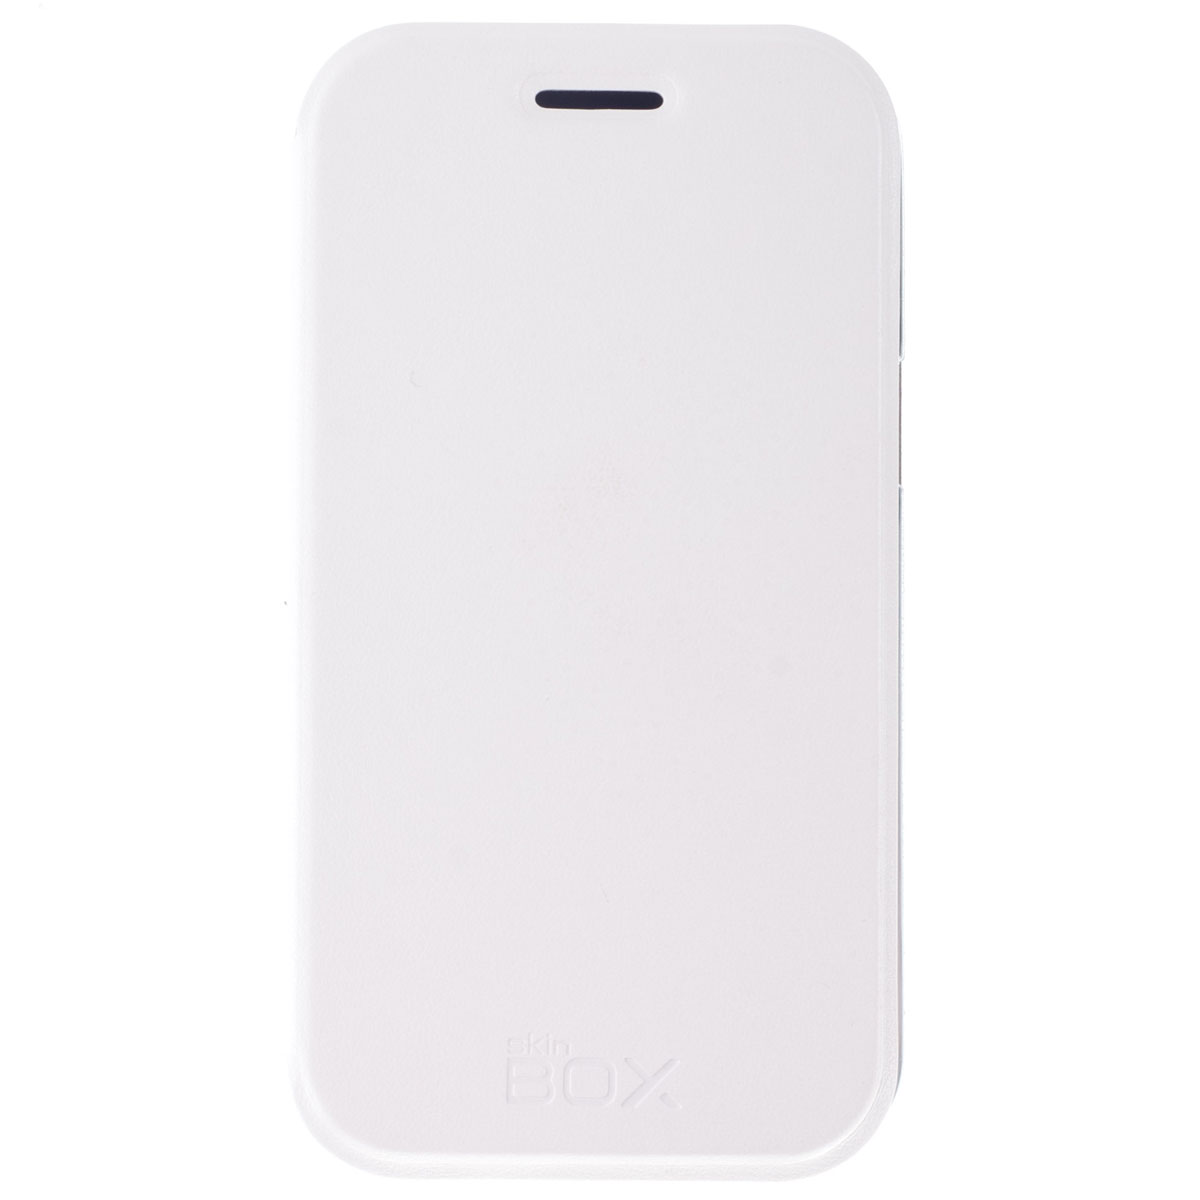 Skinbox Lux чехол для Samsung Galaxy J1 DS, White чехол защитный skinbox lenovo s660